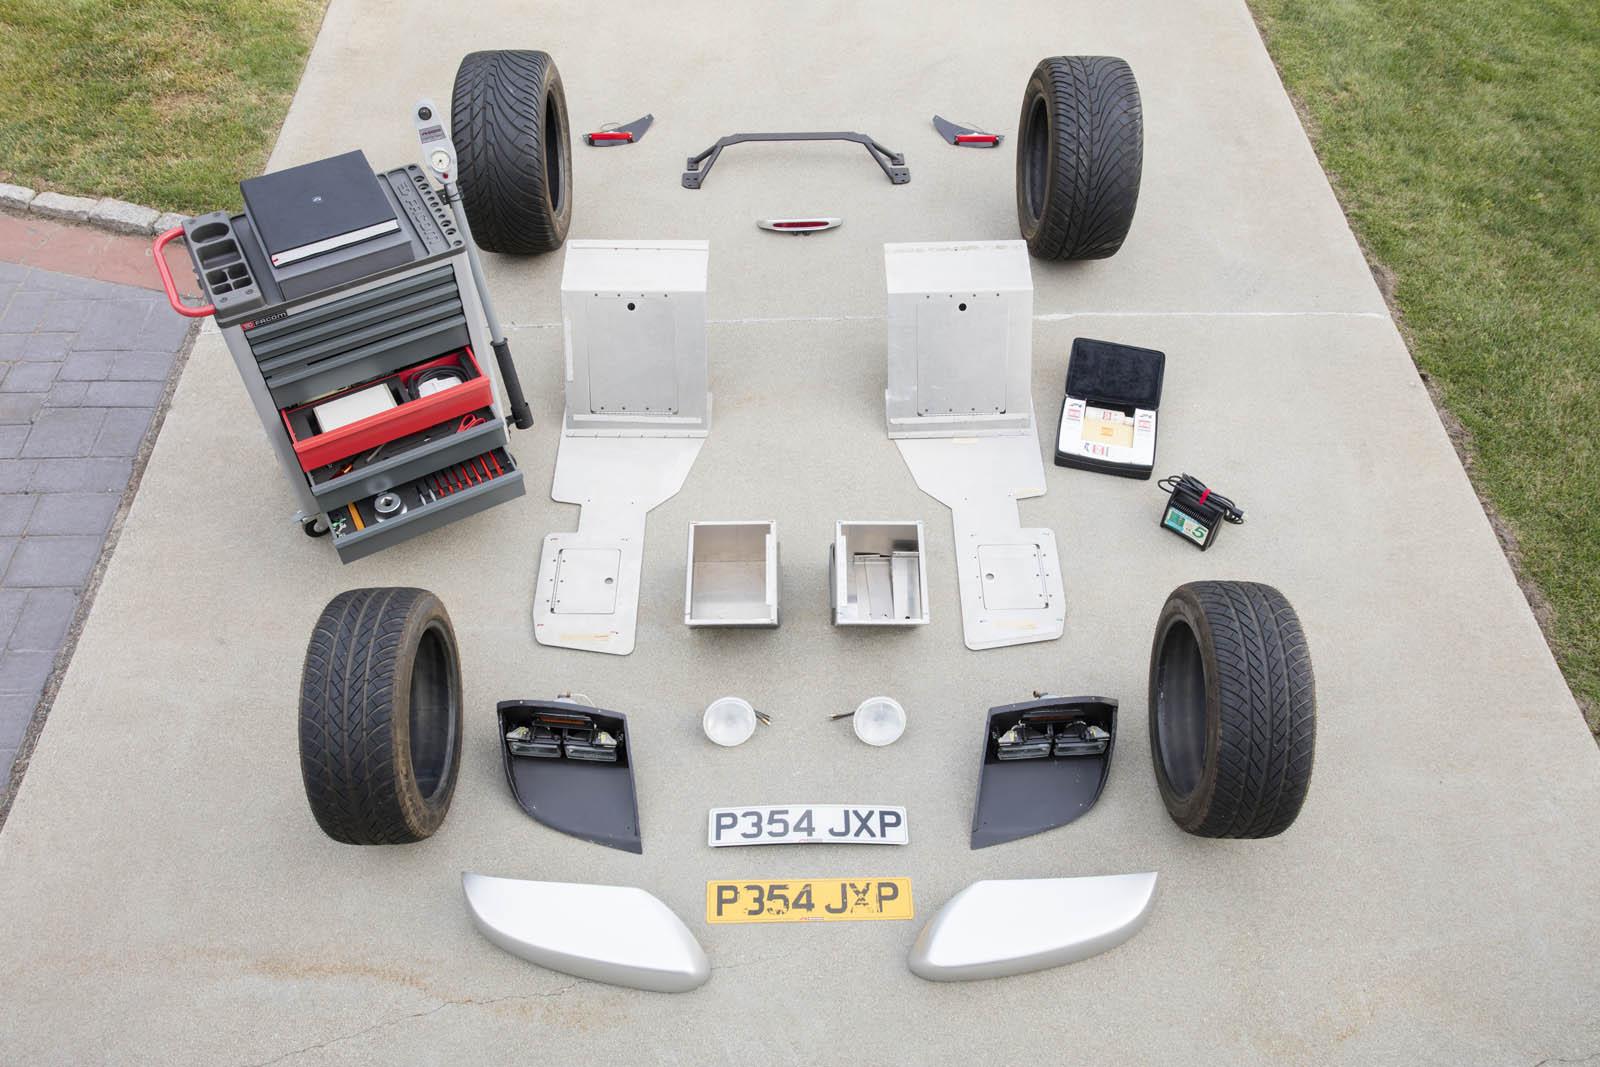 1995 McLaren F1 101 copy